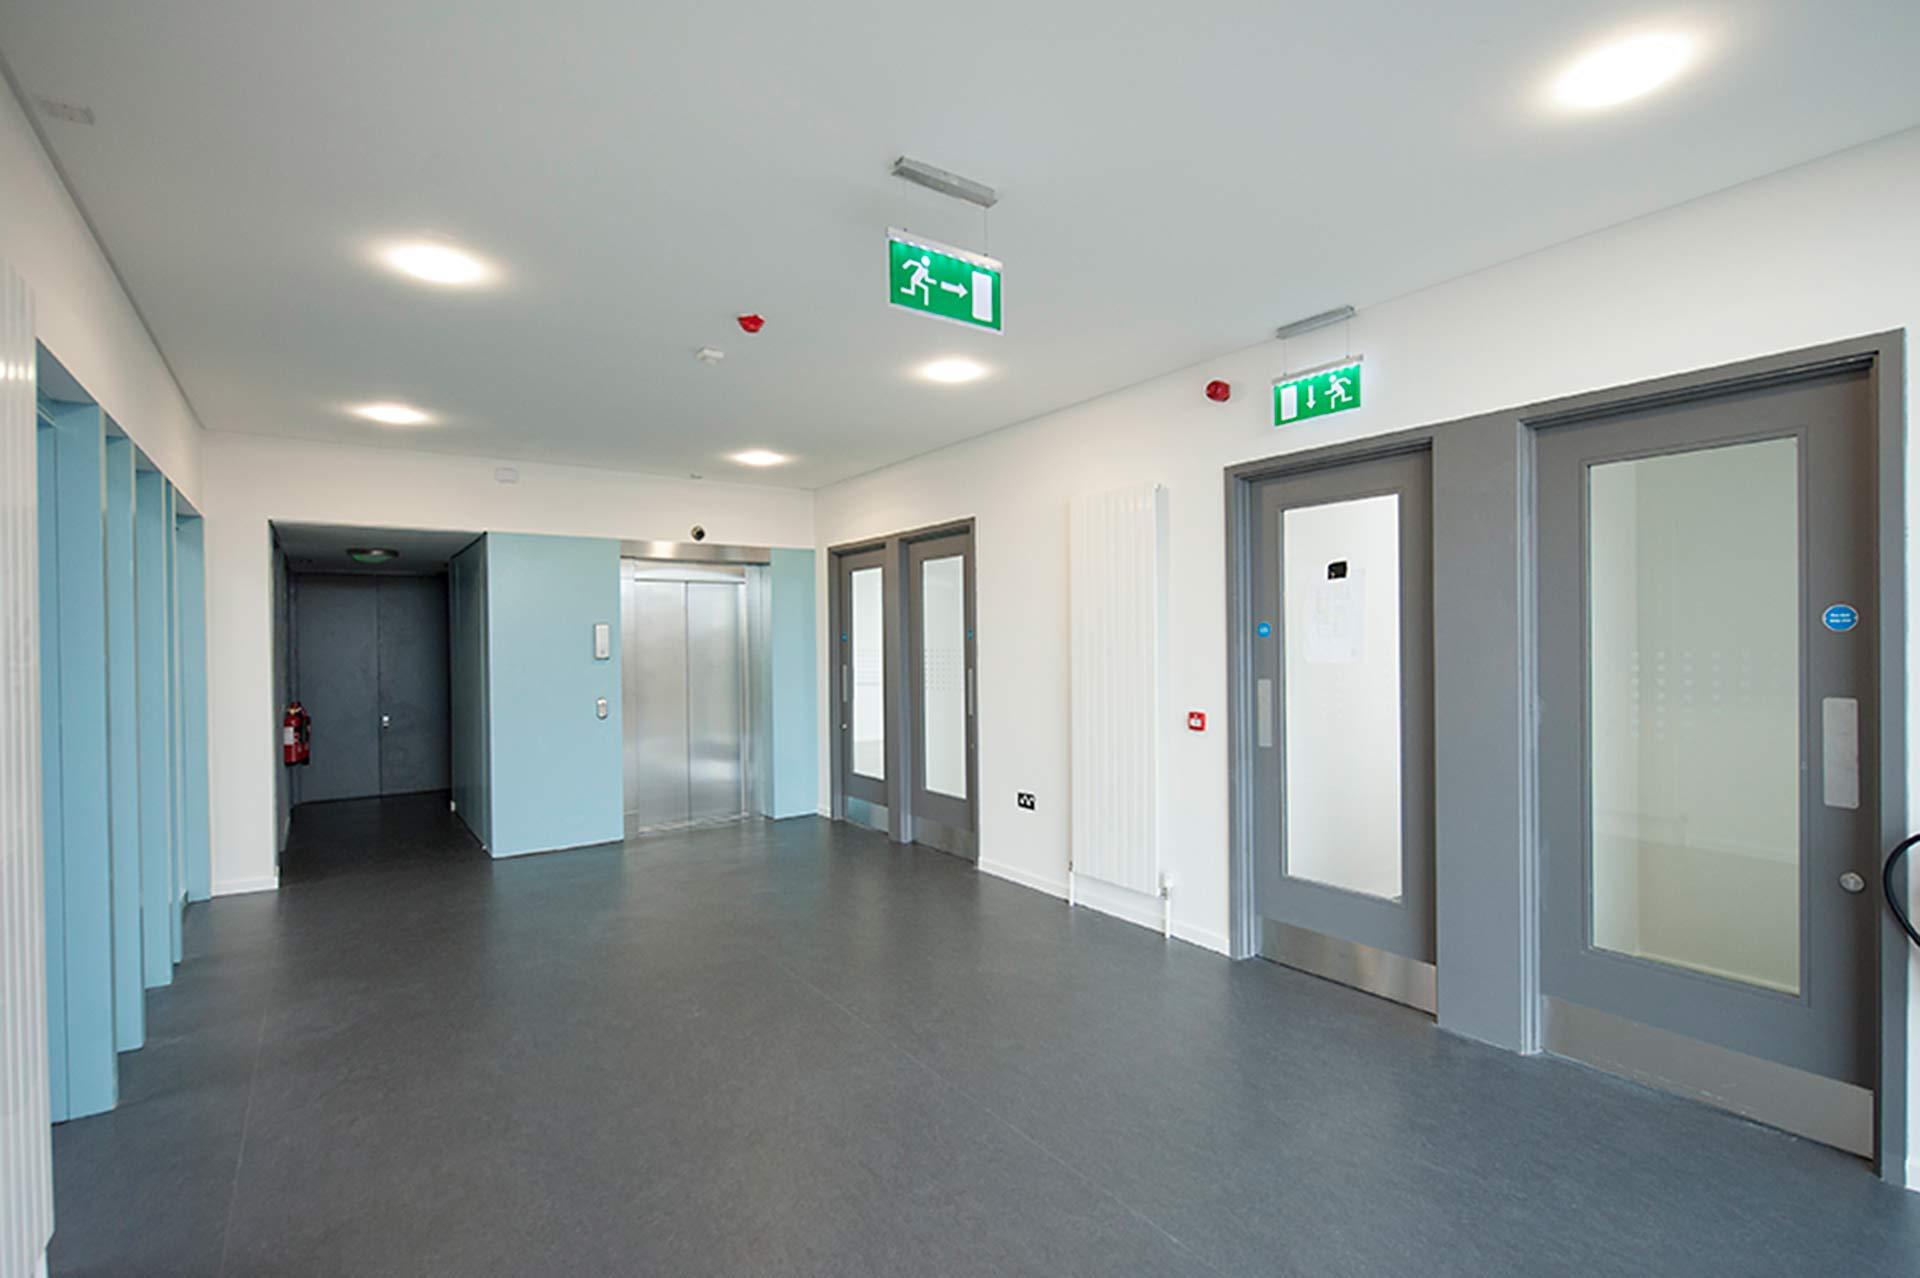 Primary Care Centre Limerick